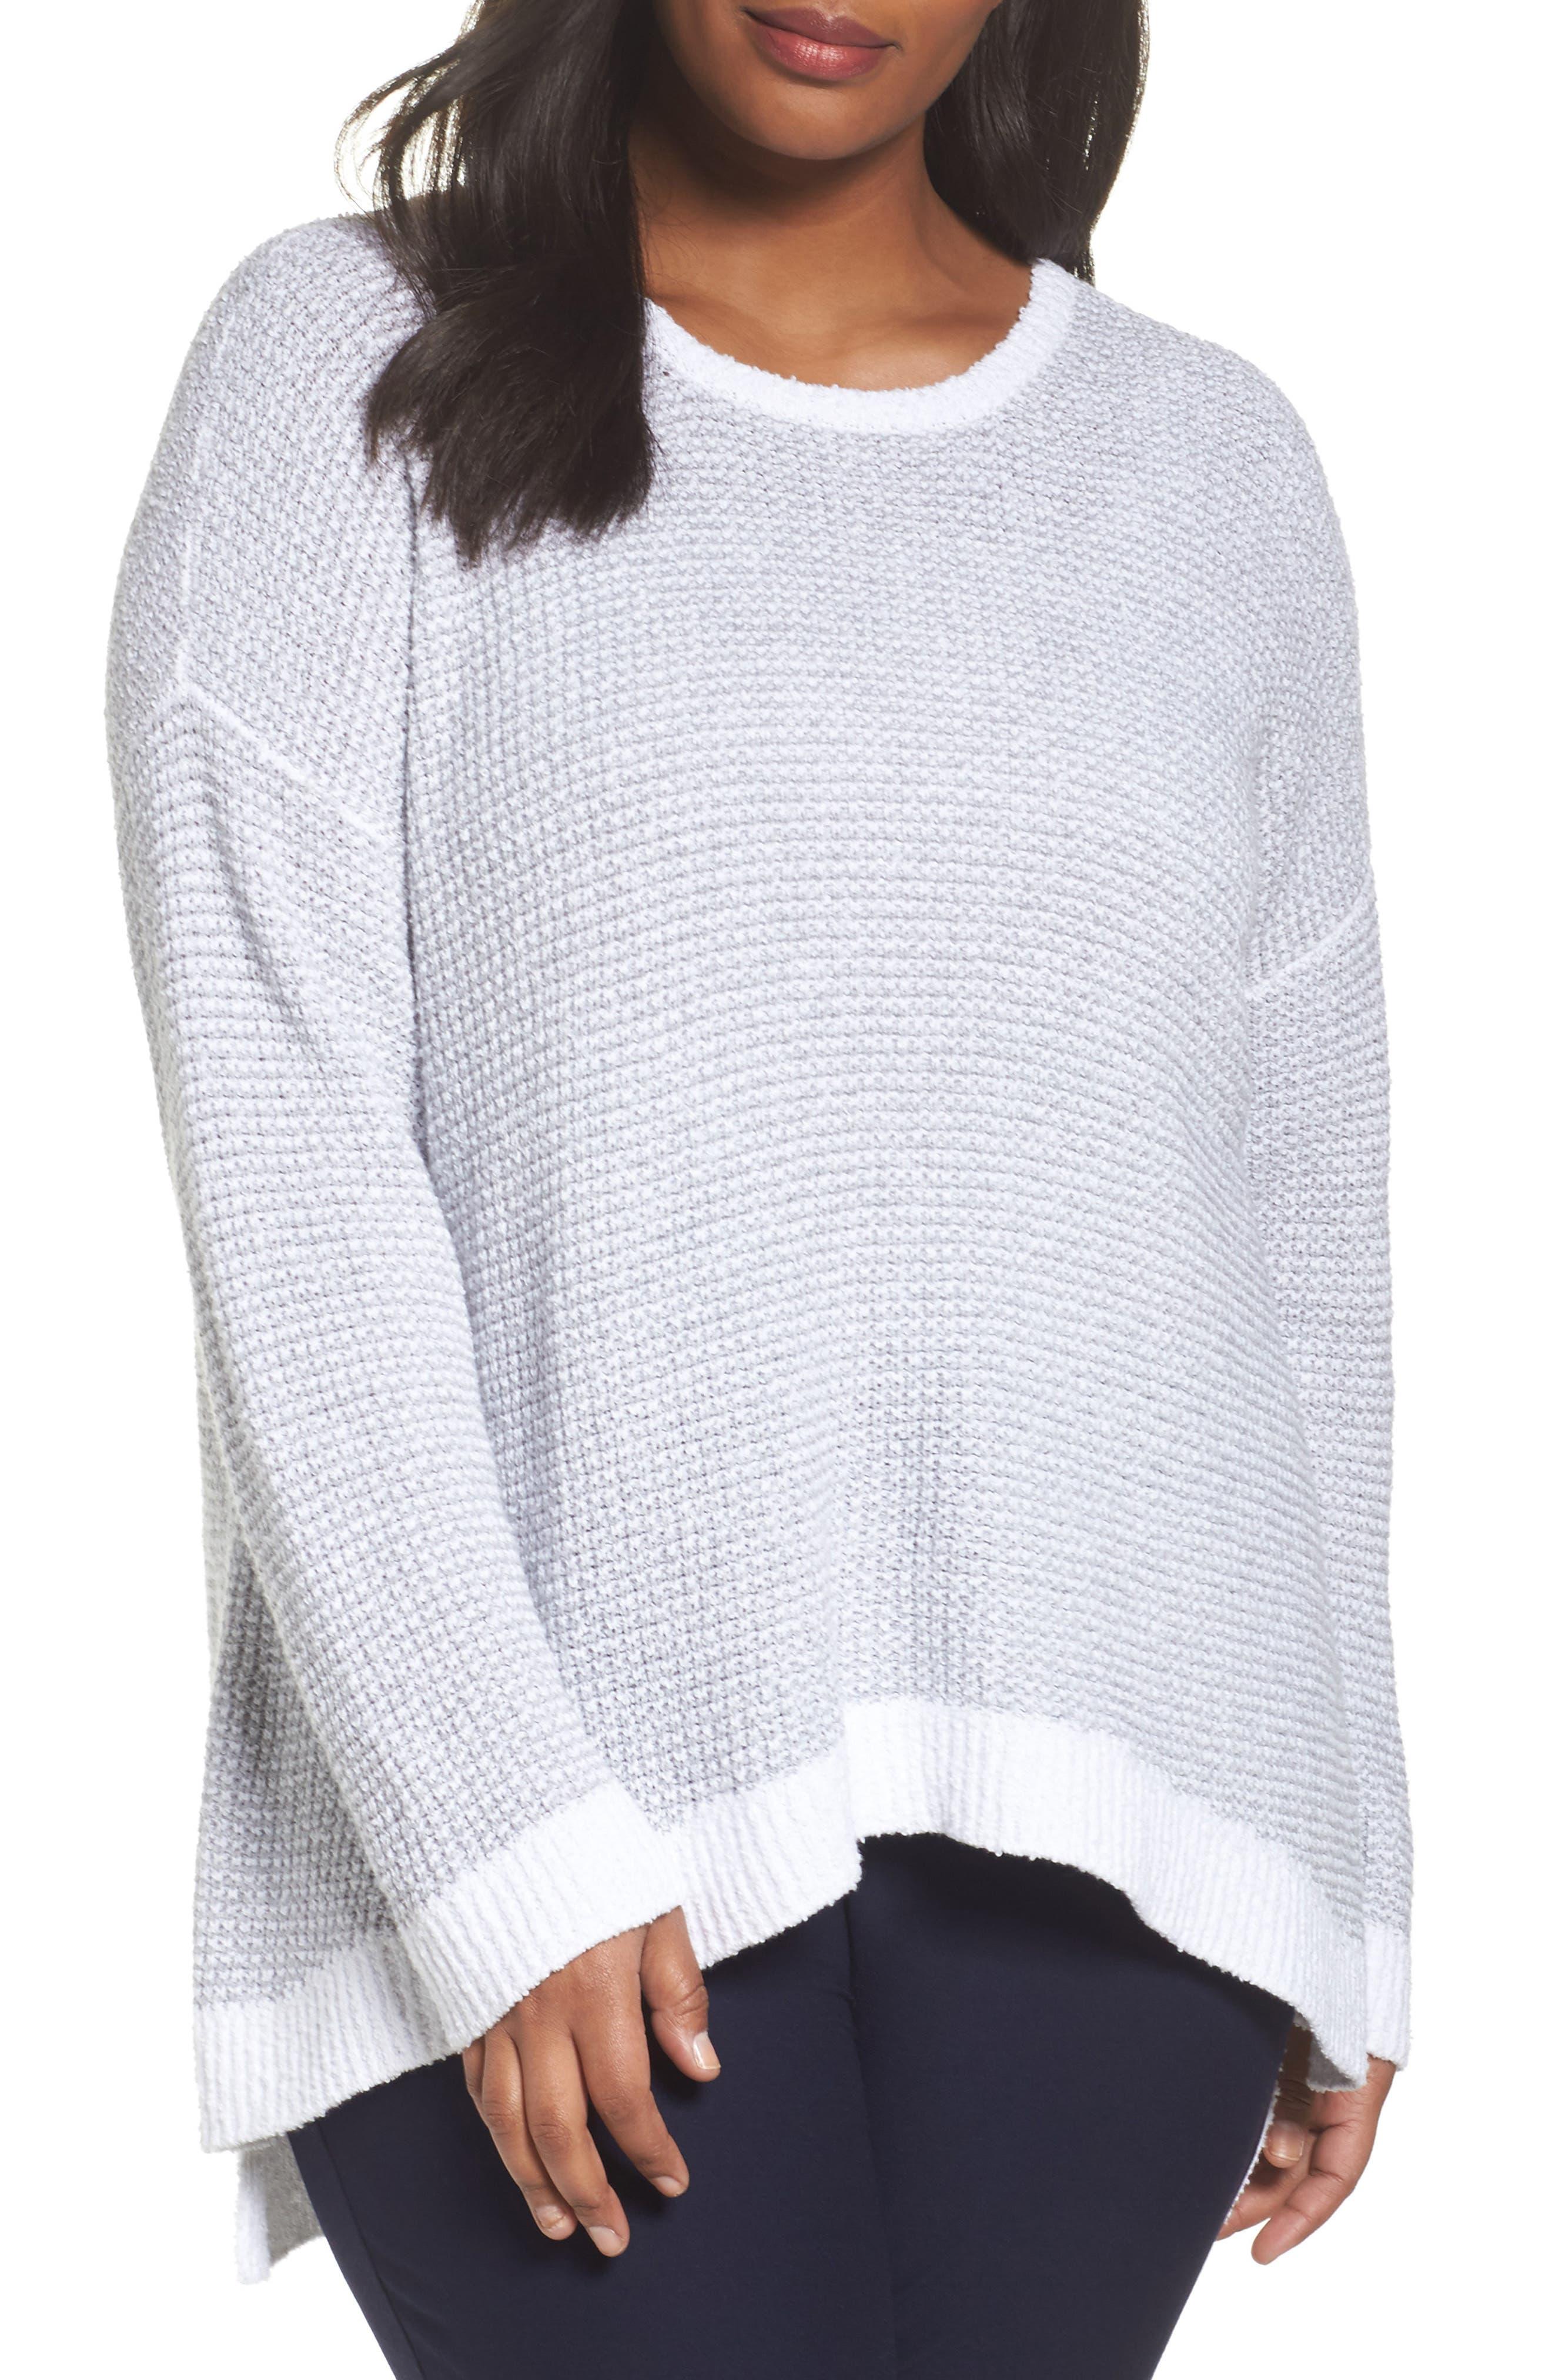 Waffled Organic Cotton Sweater,                         Main,                         color, Grey